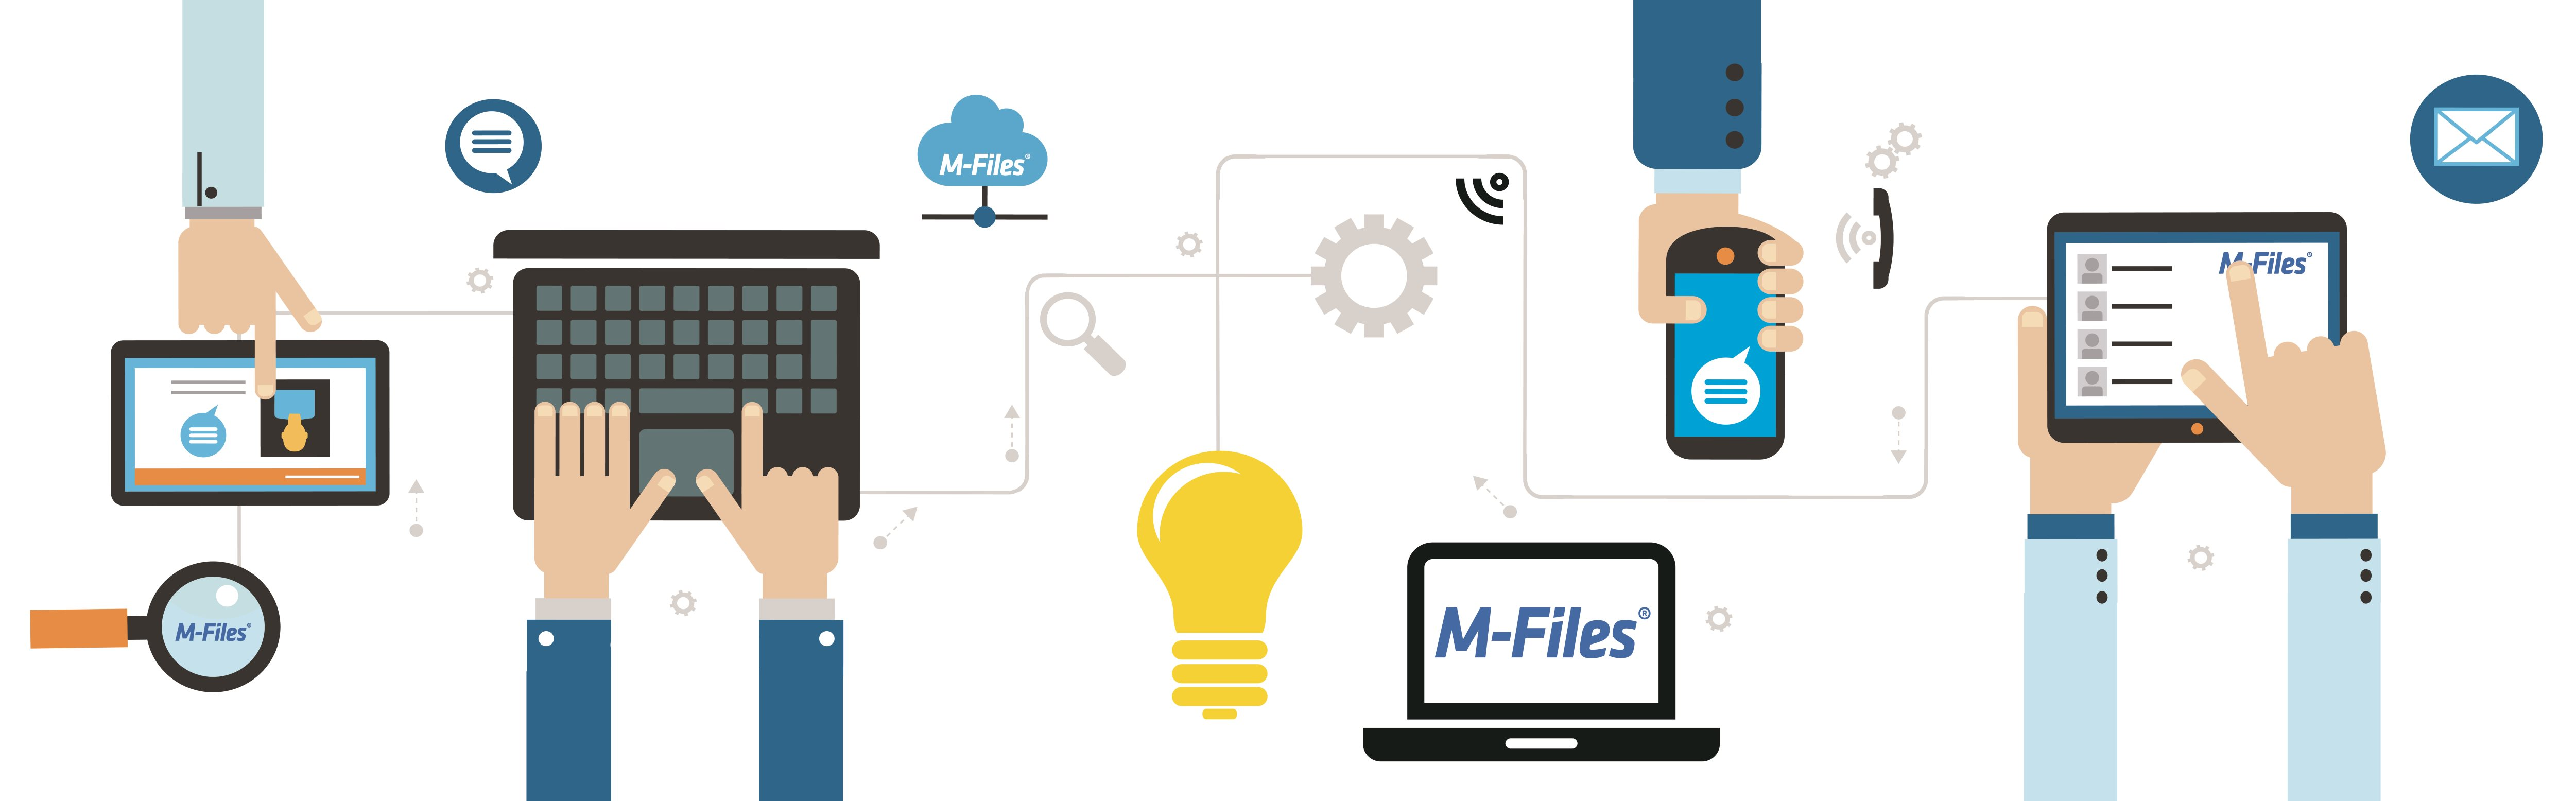 M-Files 2 (5) 1